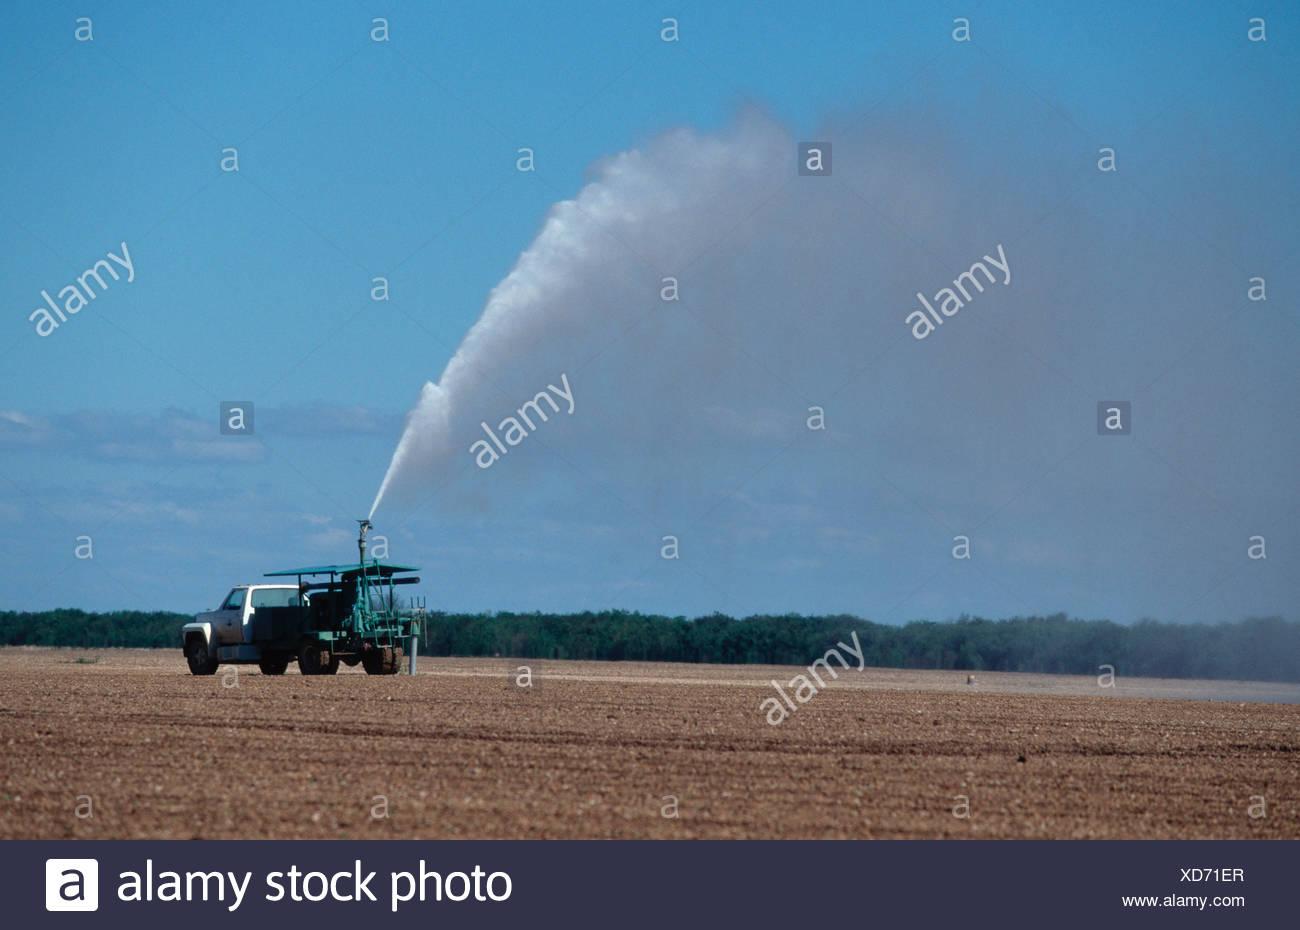 Pumper Truck plying fields Everglades Florida USA - Stock Image